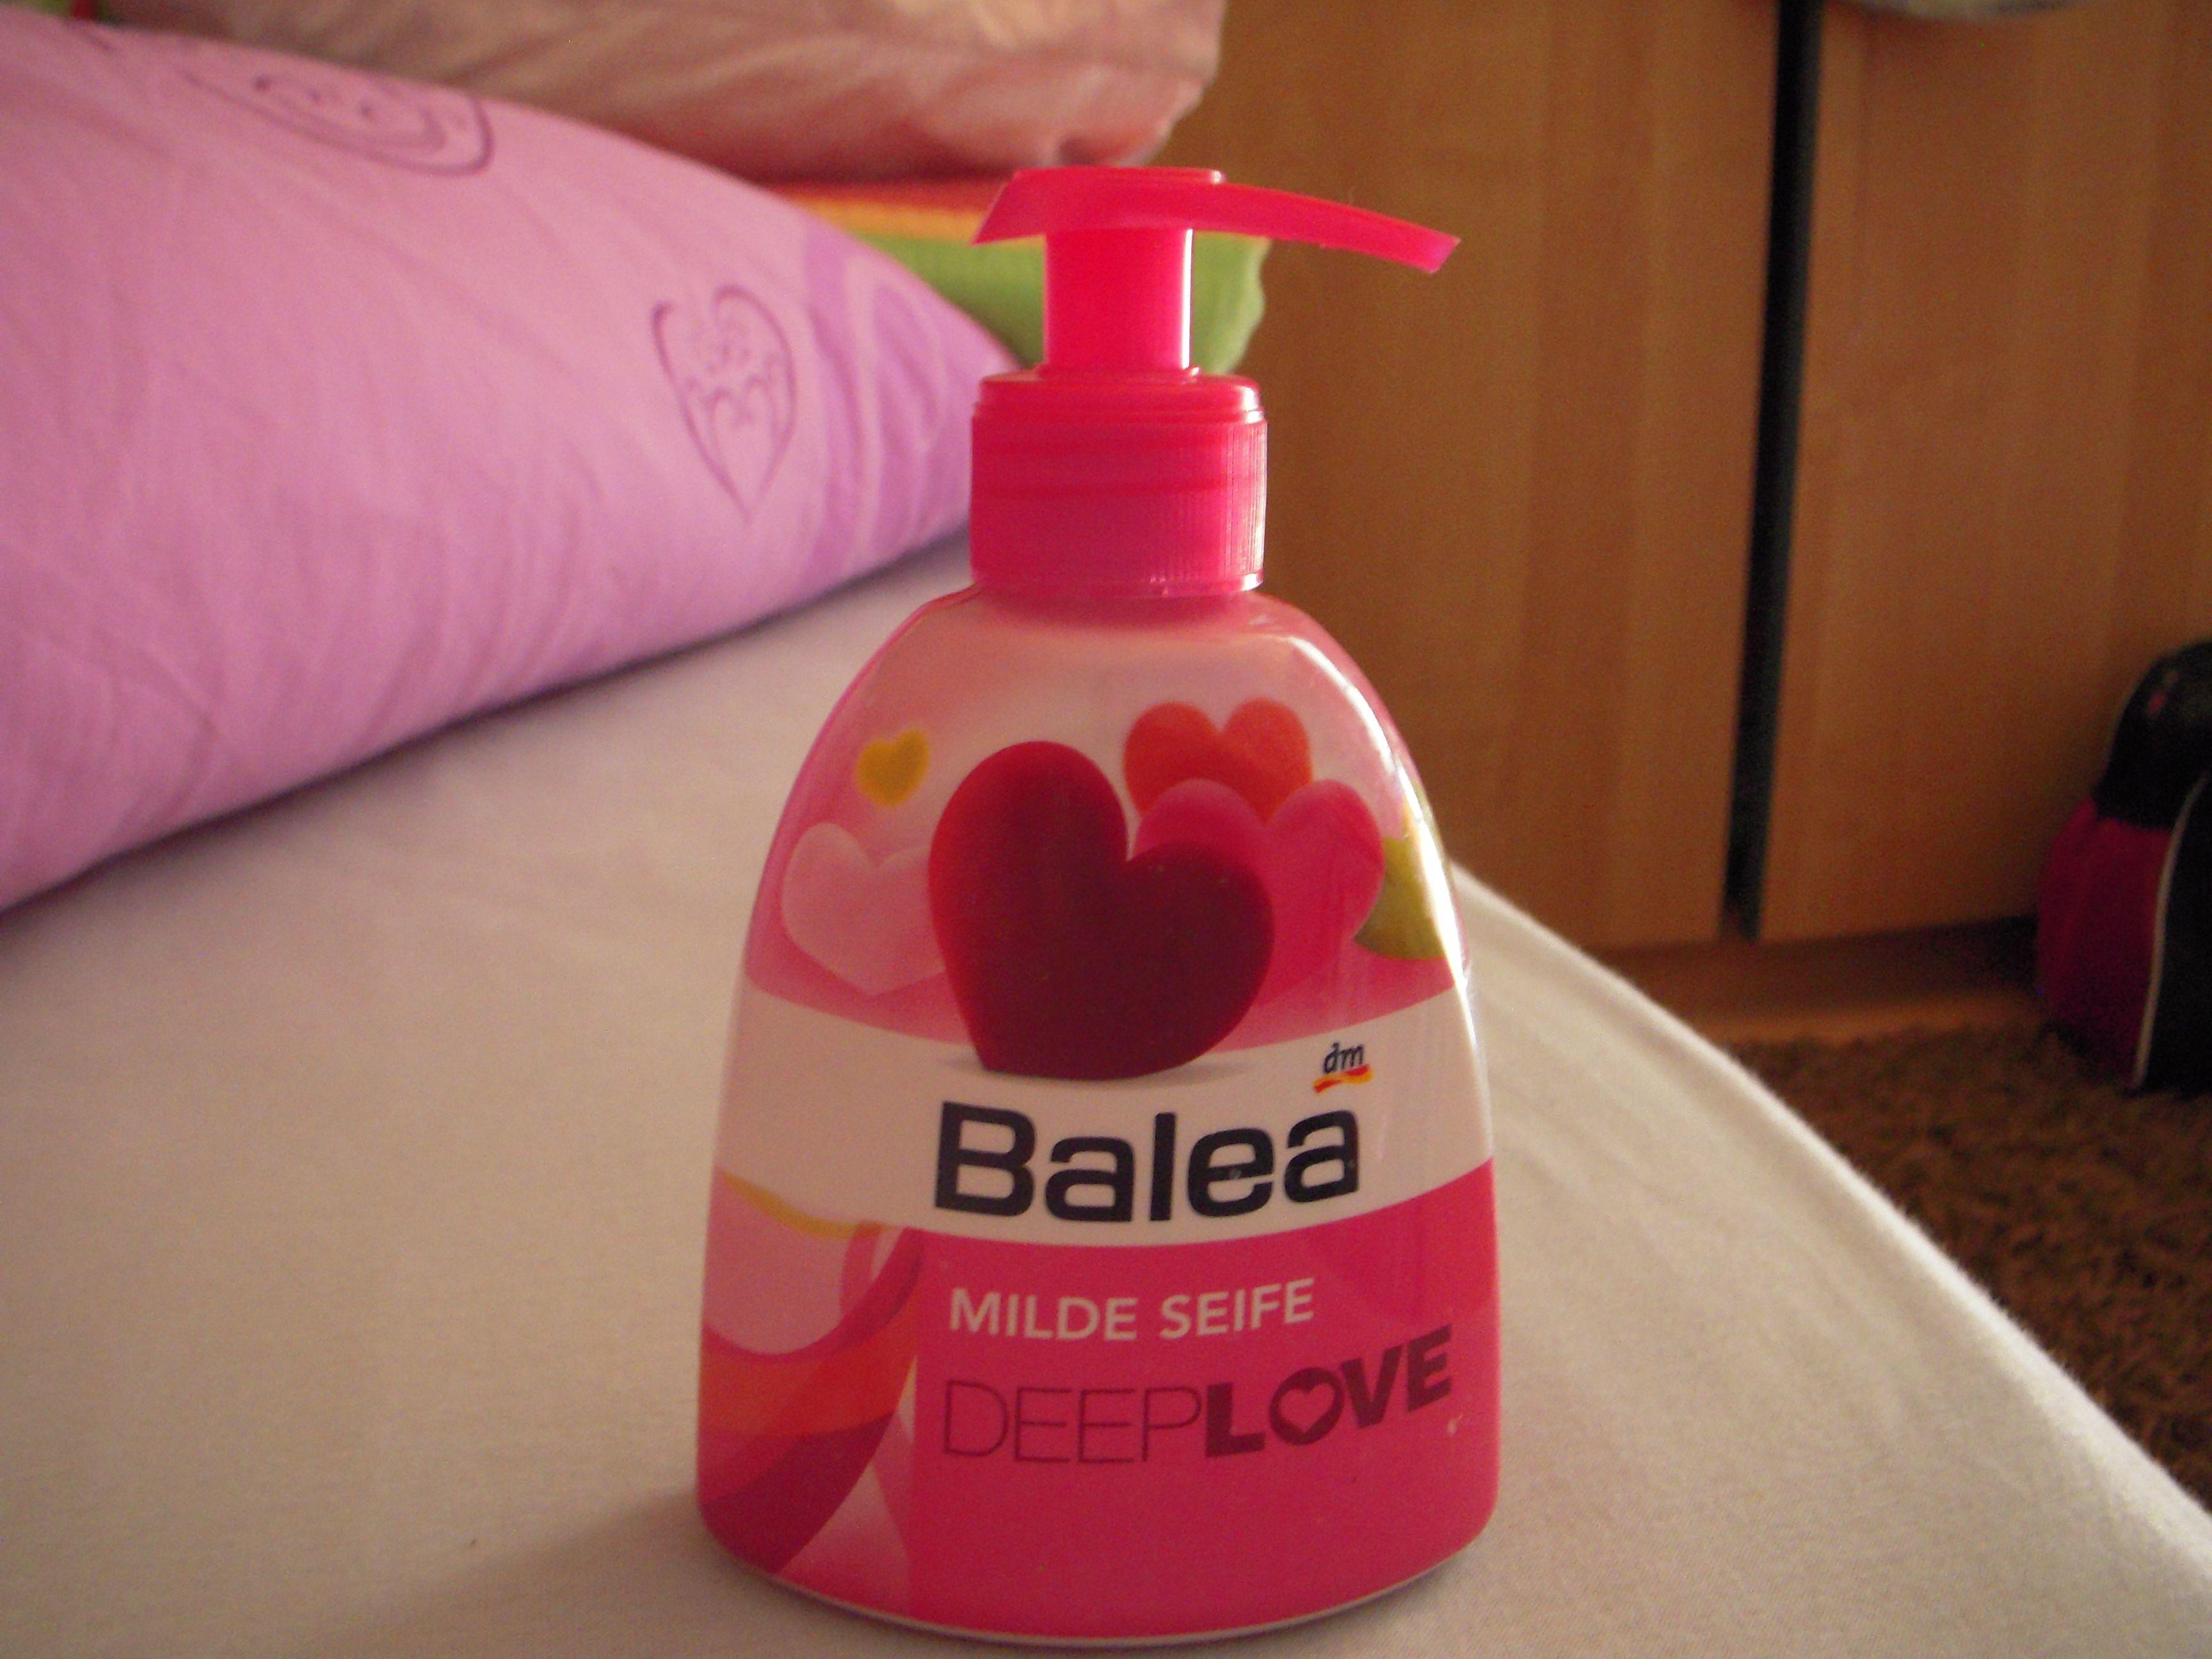 Balea Milde Seife Deep Love Schminktipps Kosmetik Und Beauty